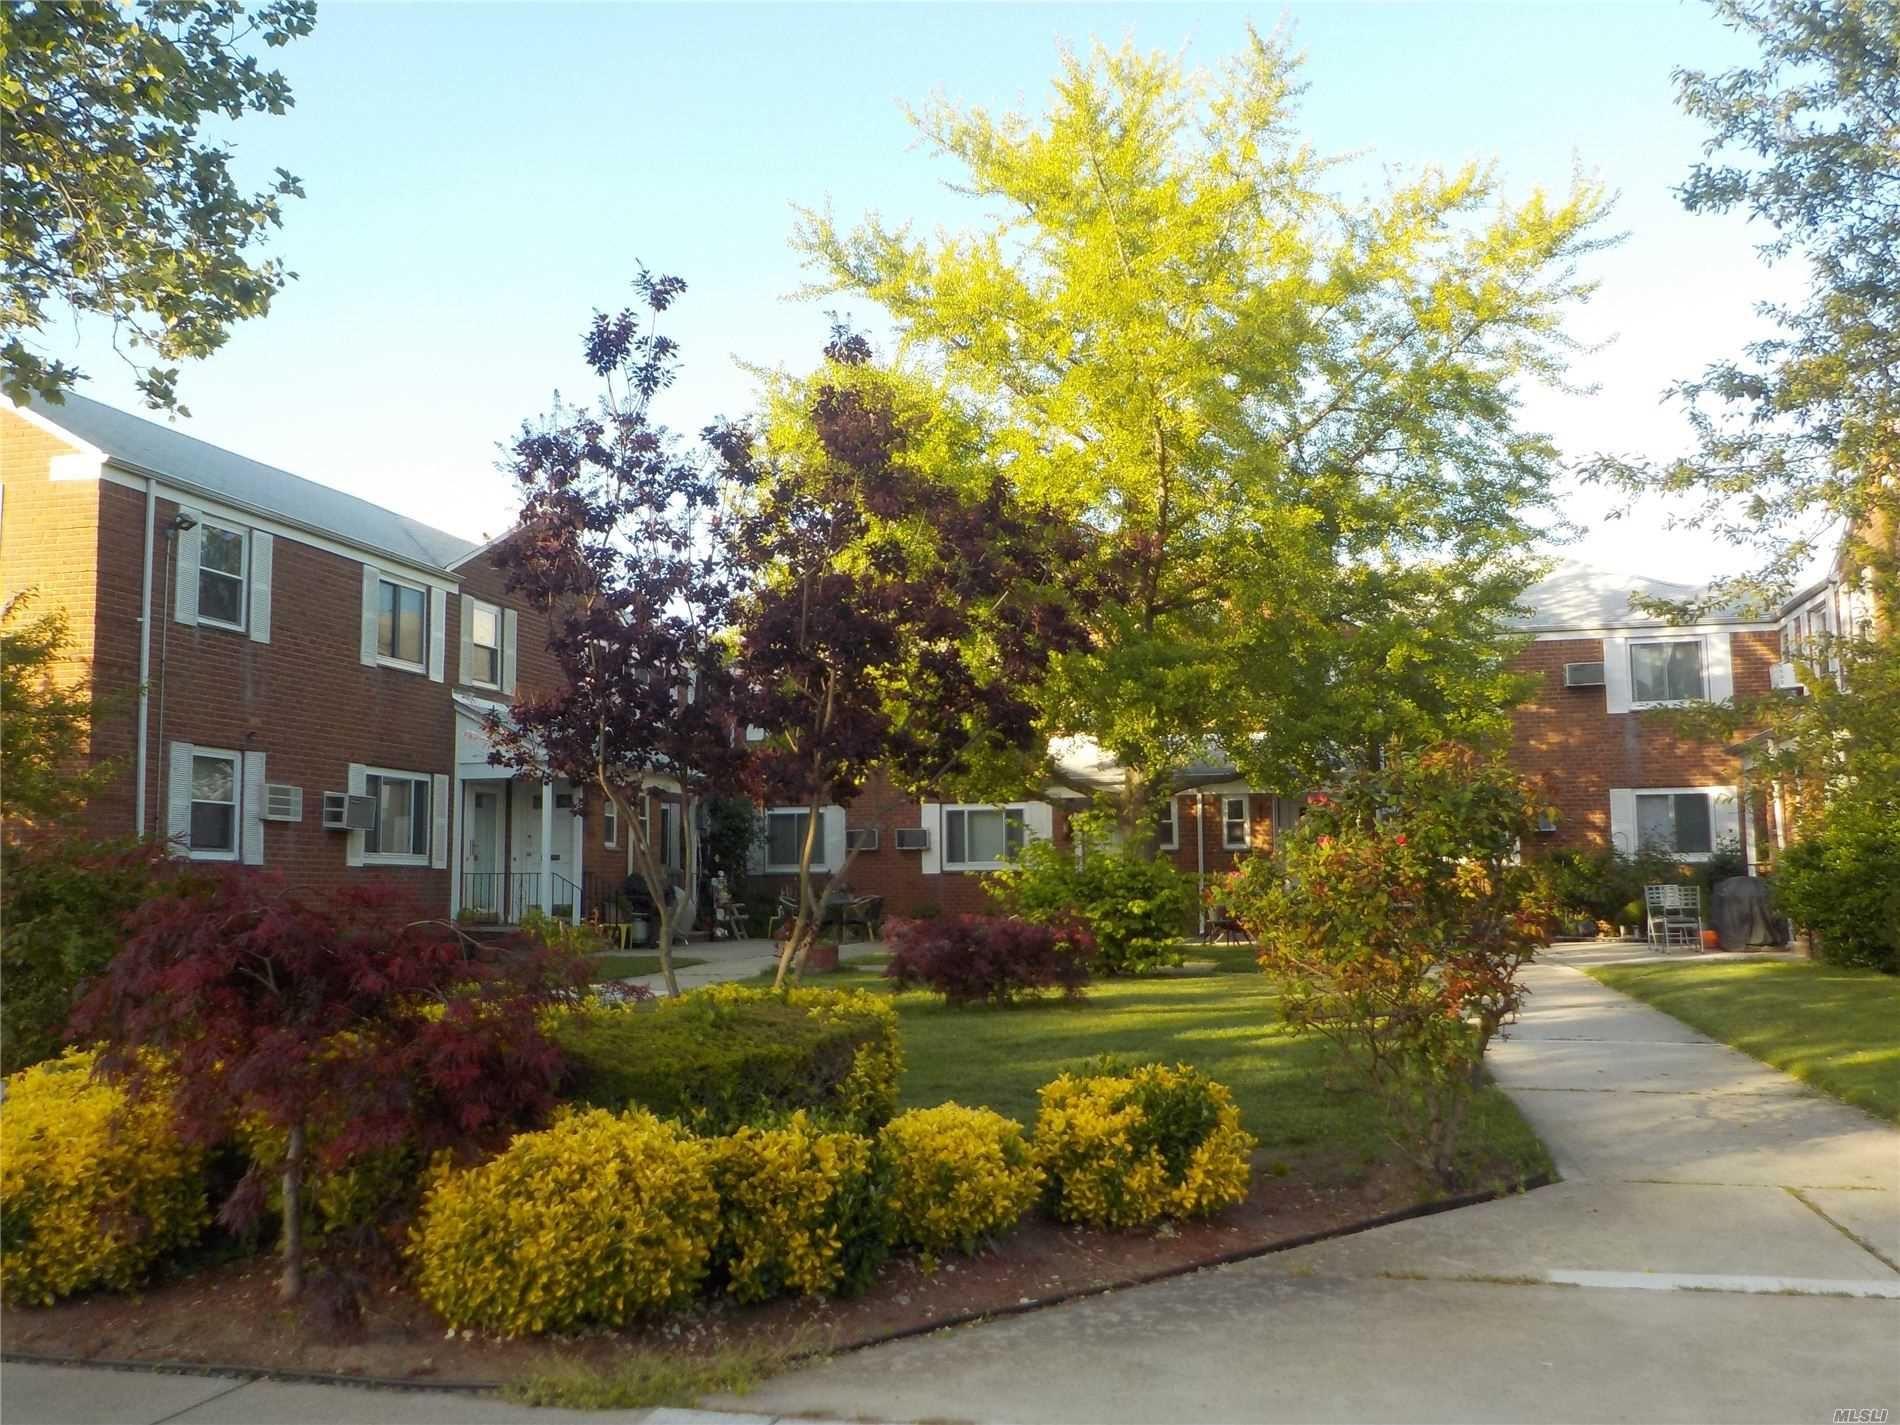 75-05 Commonwealth Boulevard #2nd fl, Bellerose, NY 11426 - MLS#: 3227916